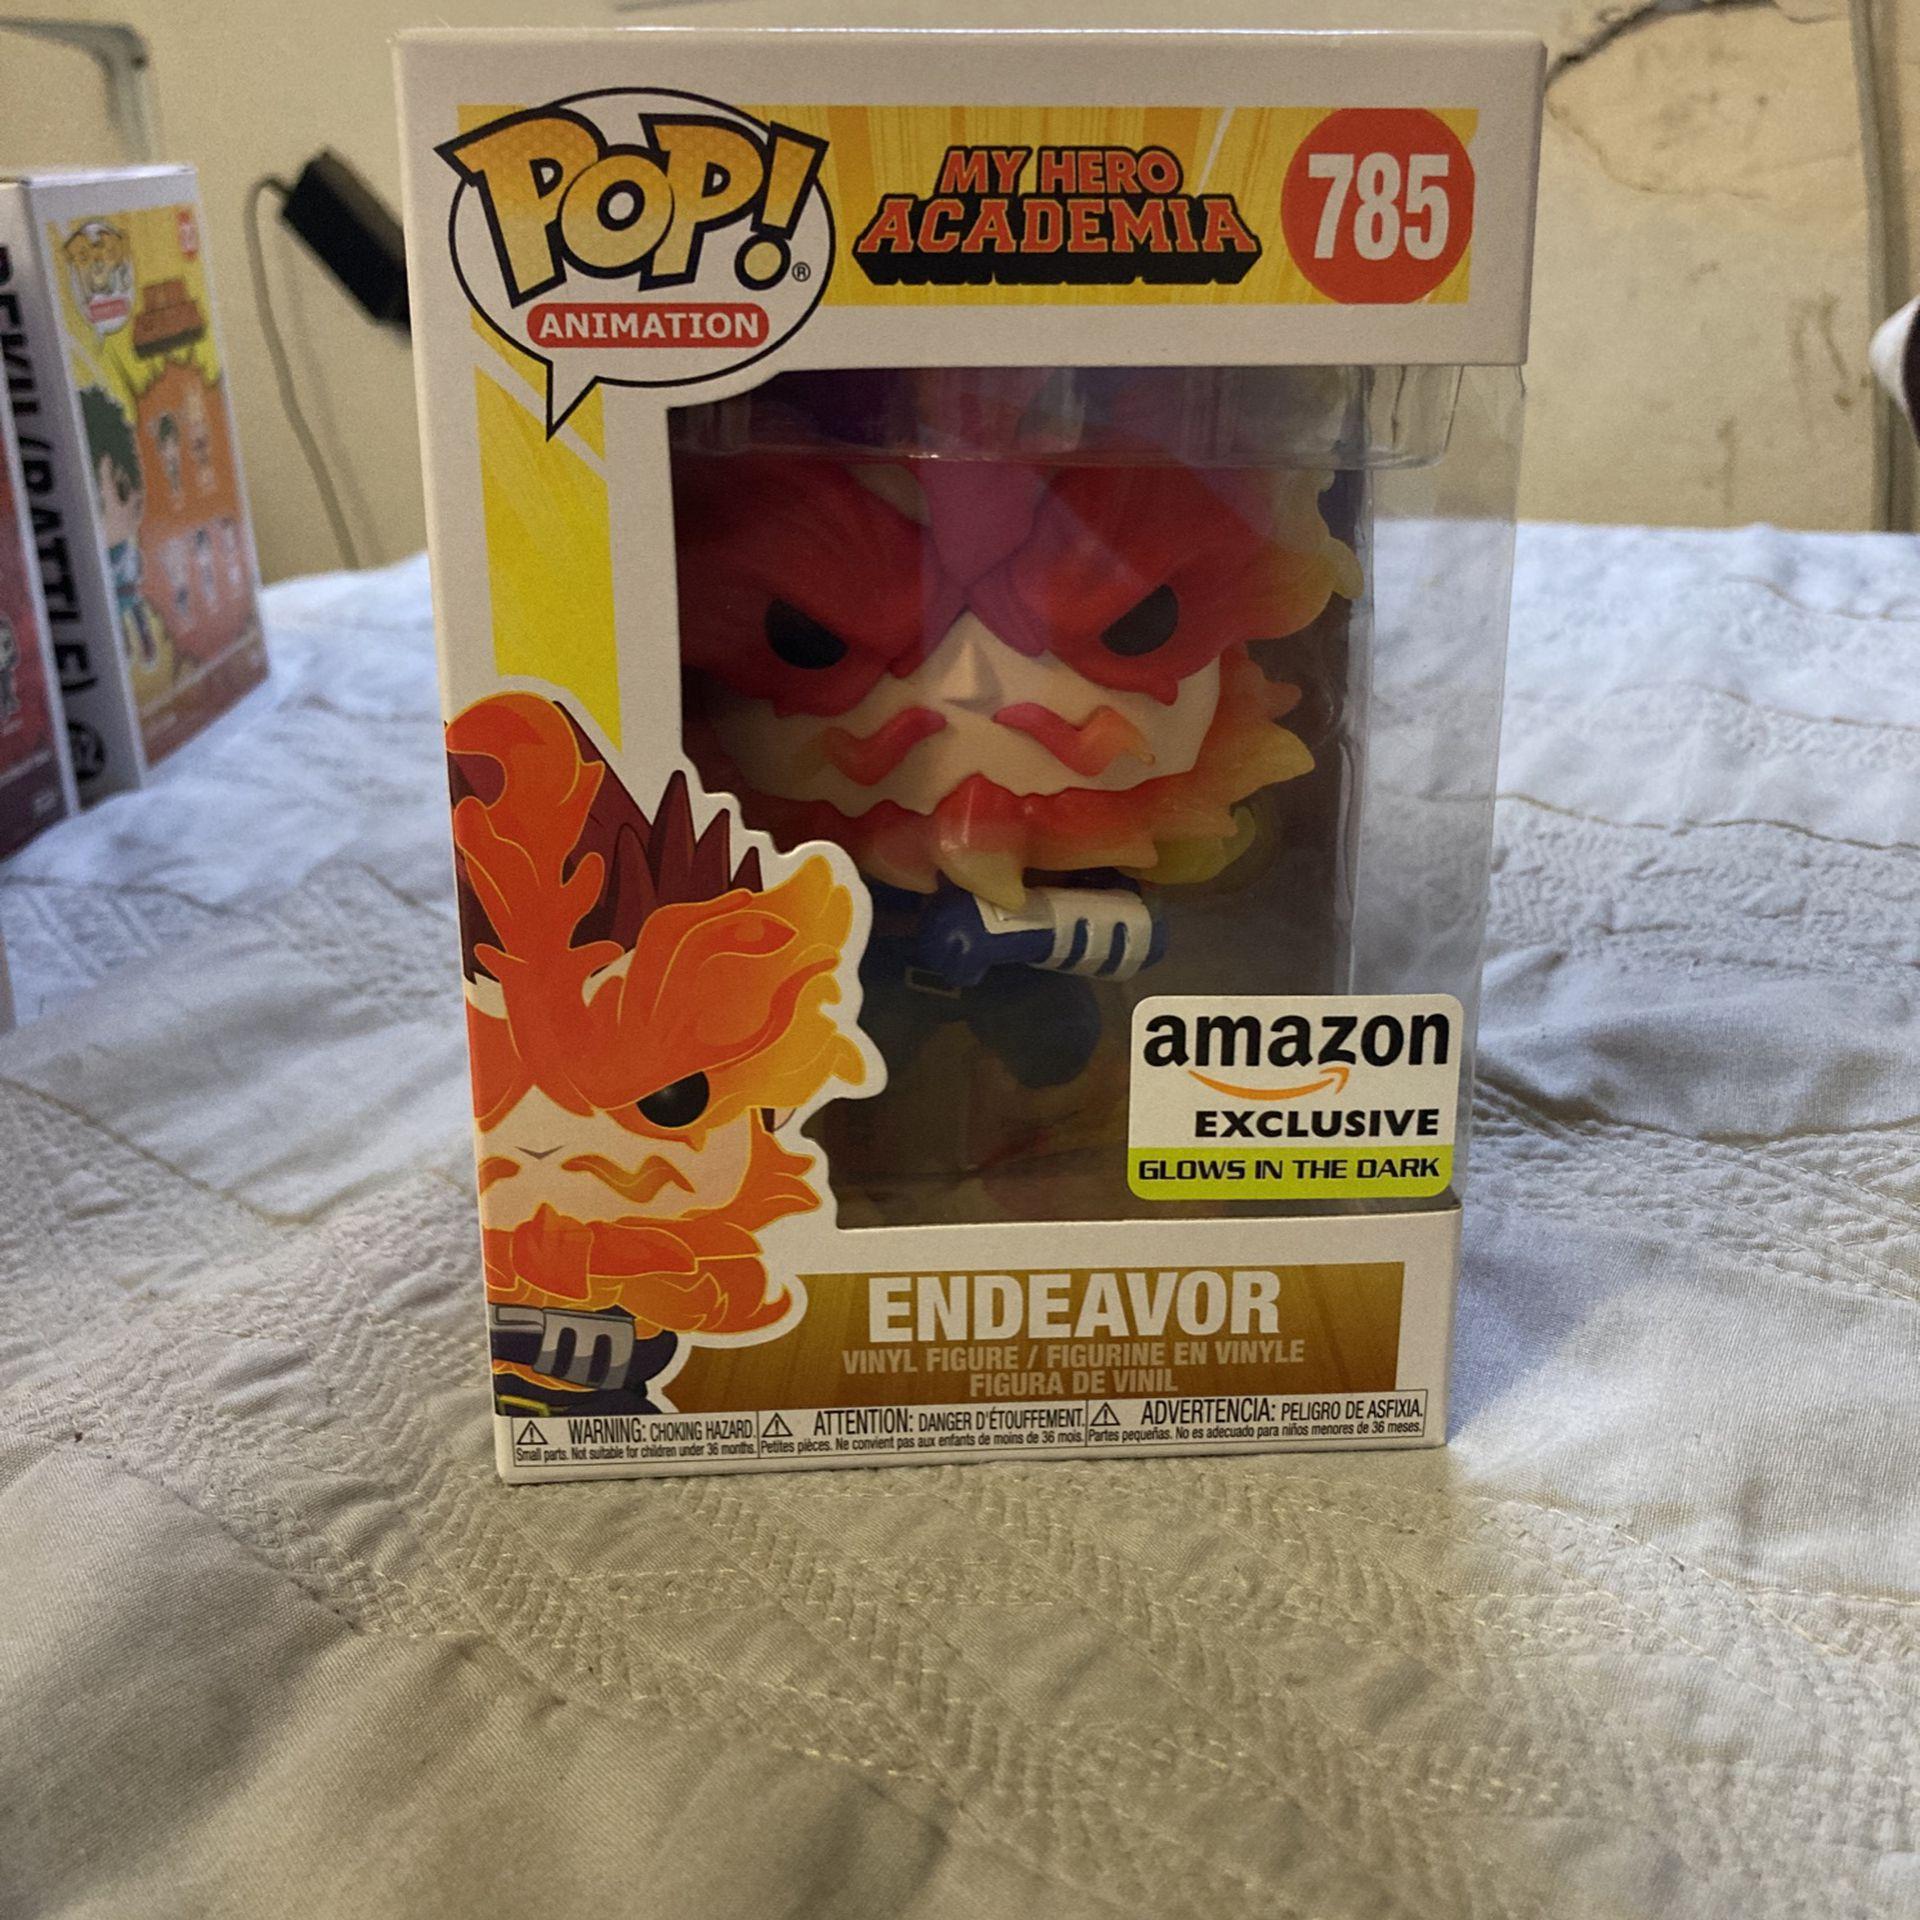 Endeavor FUNKO POP exclusive